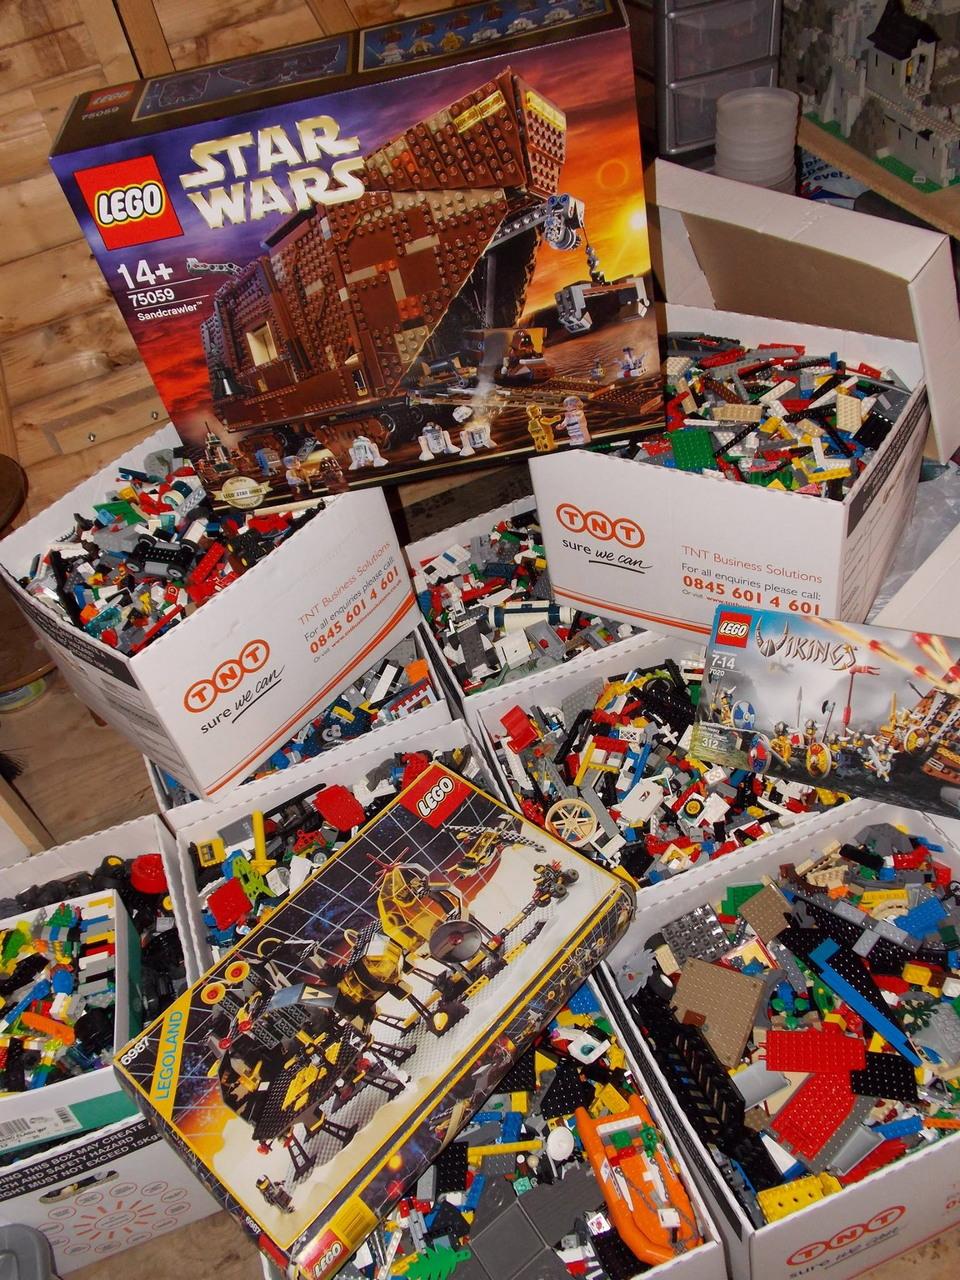 Фанат Лего построил 5 зданий для своей коллекции